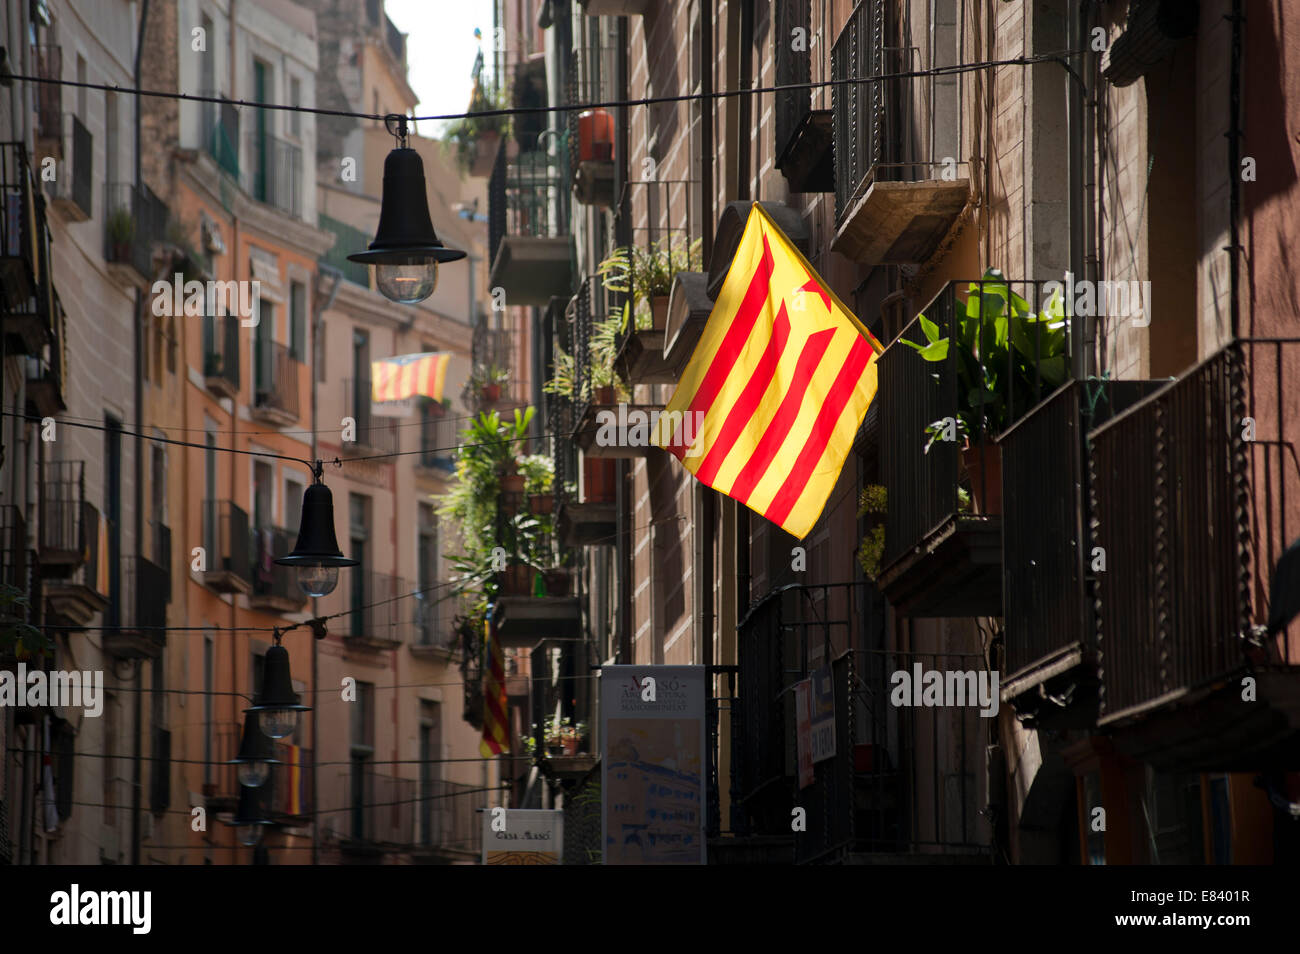 Catalonia region of Spain. 30th Sept, 2014. Catalonia region of Spain, flying the Catalonian flag in anticipation - Stock Image